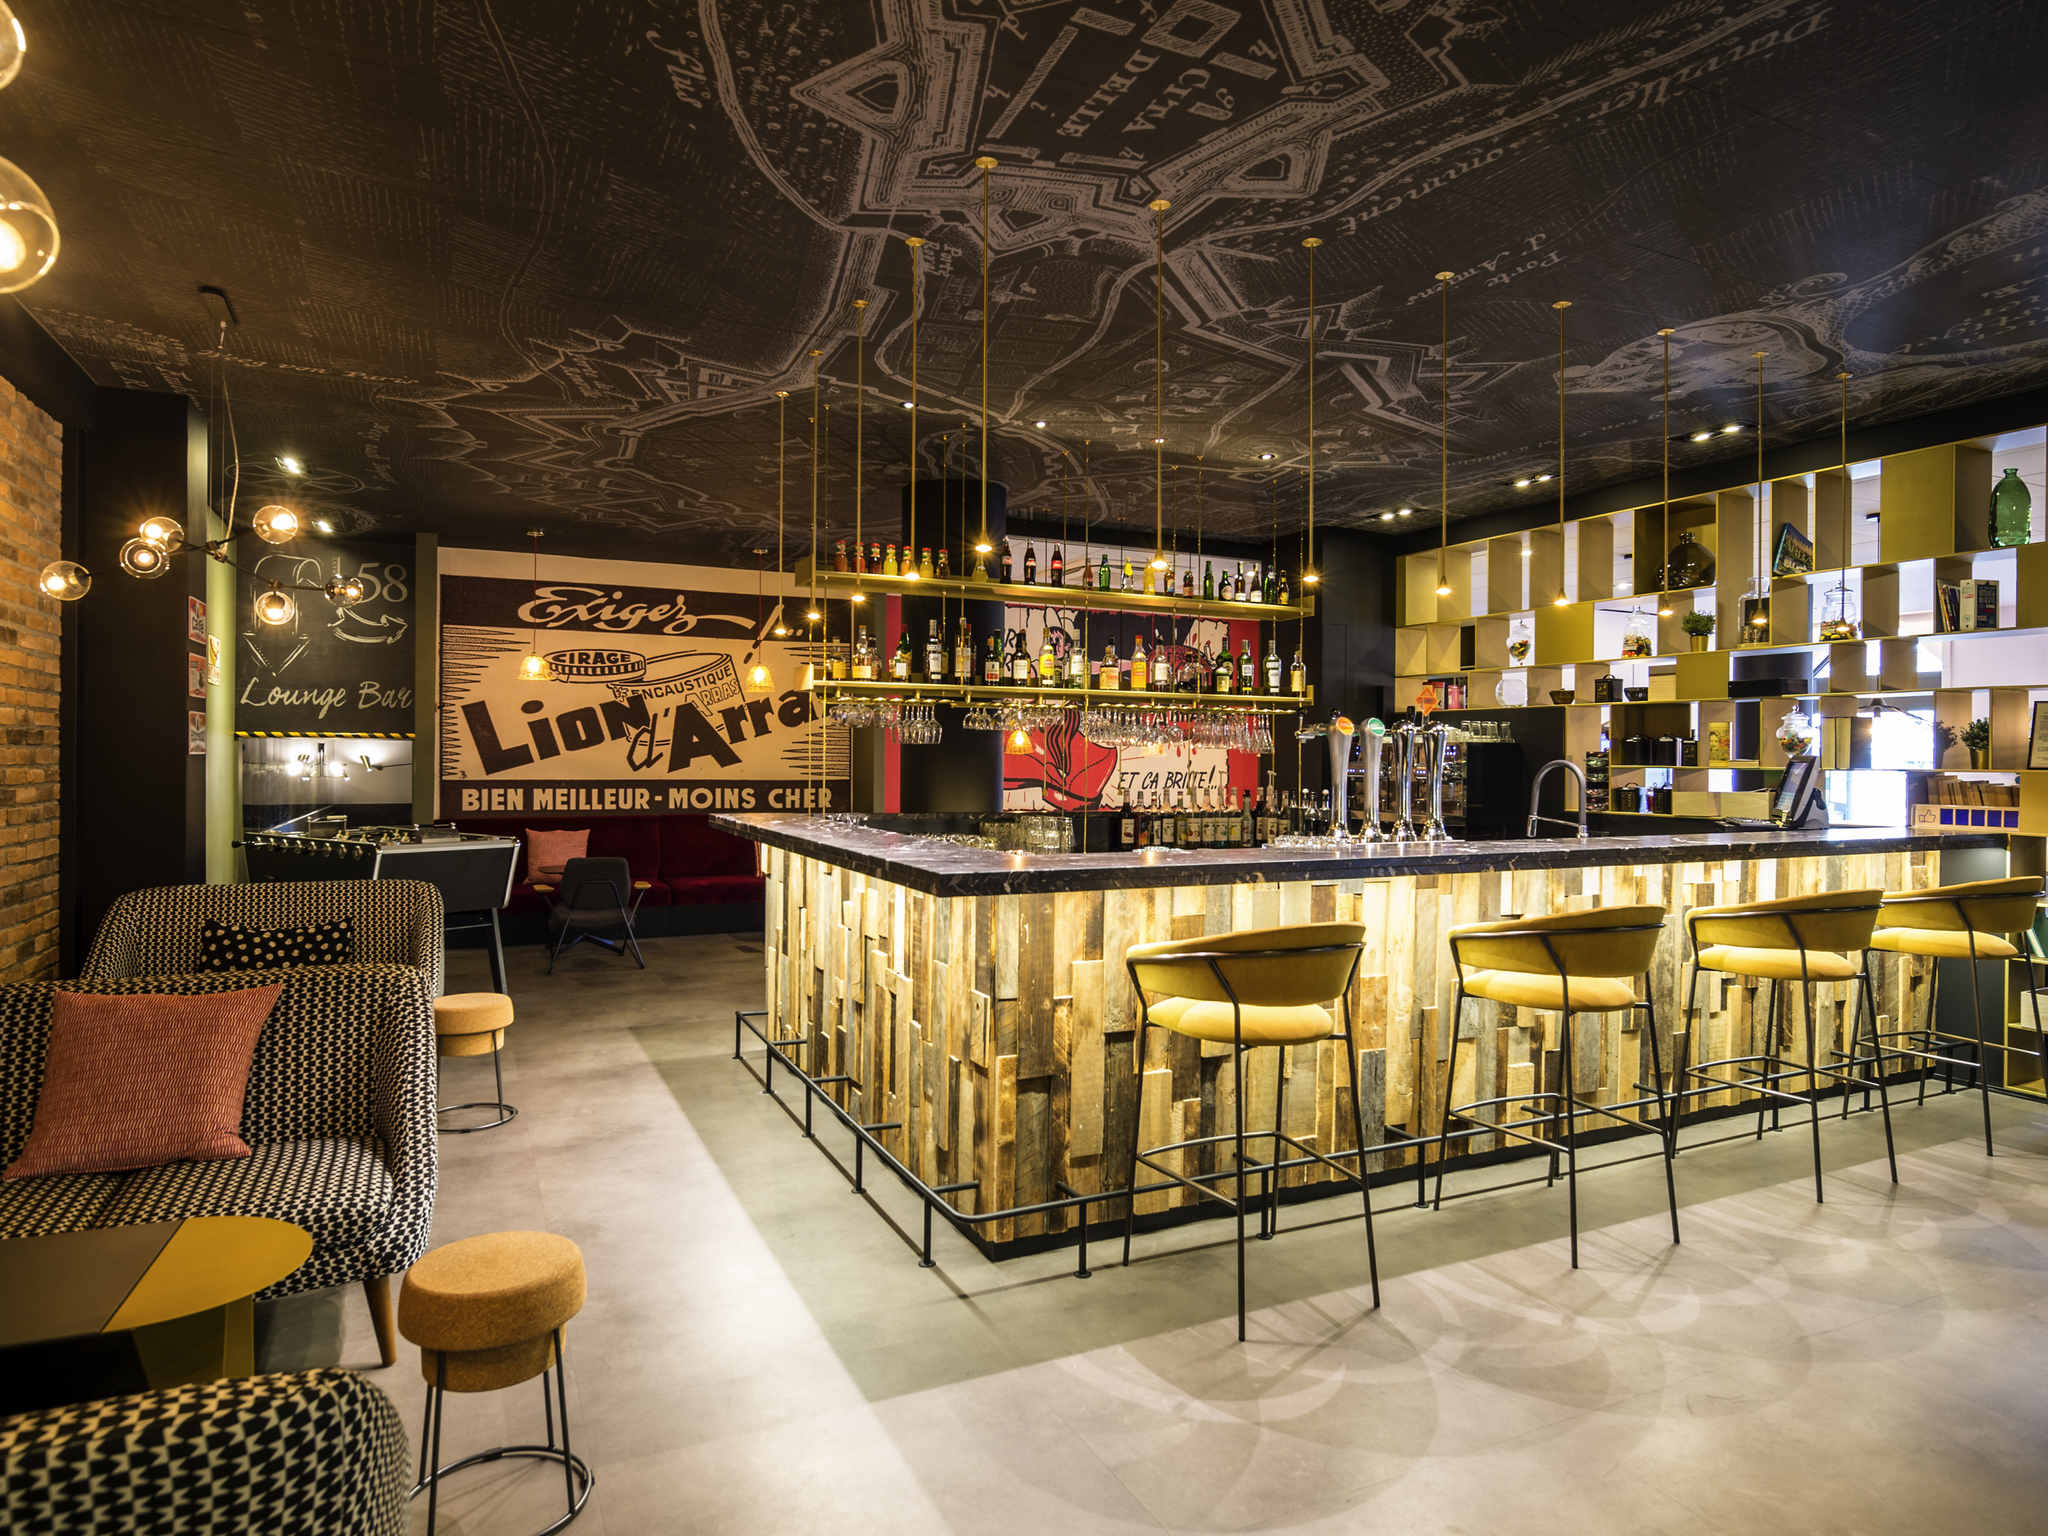 Hotel – Albergo Mercure Arras Centre Gare